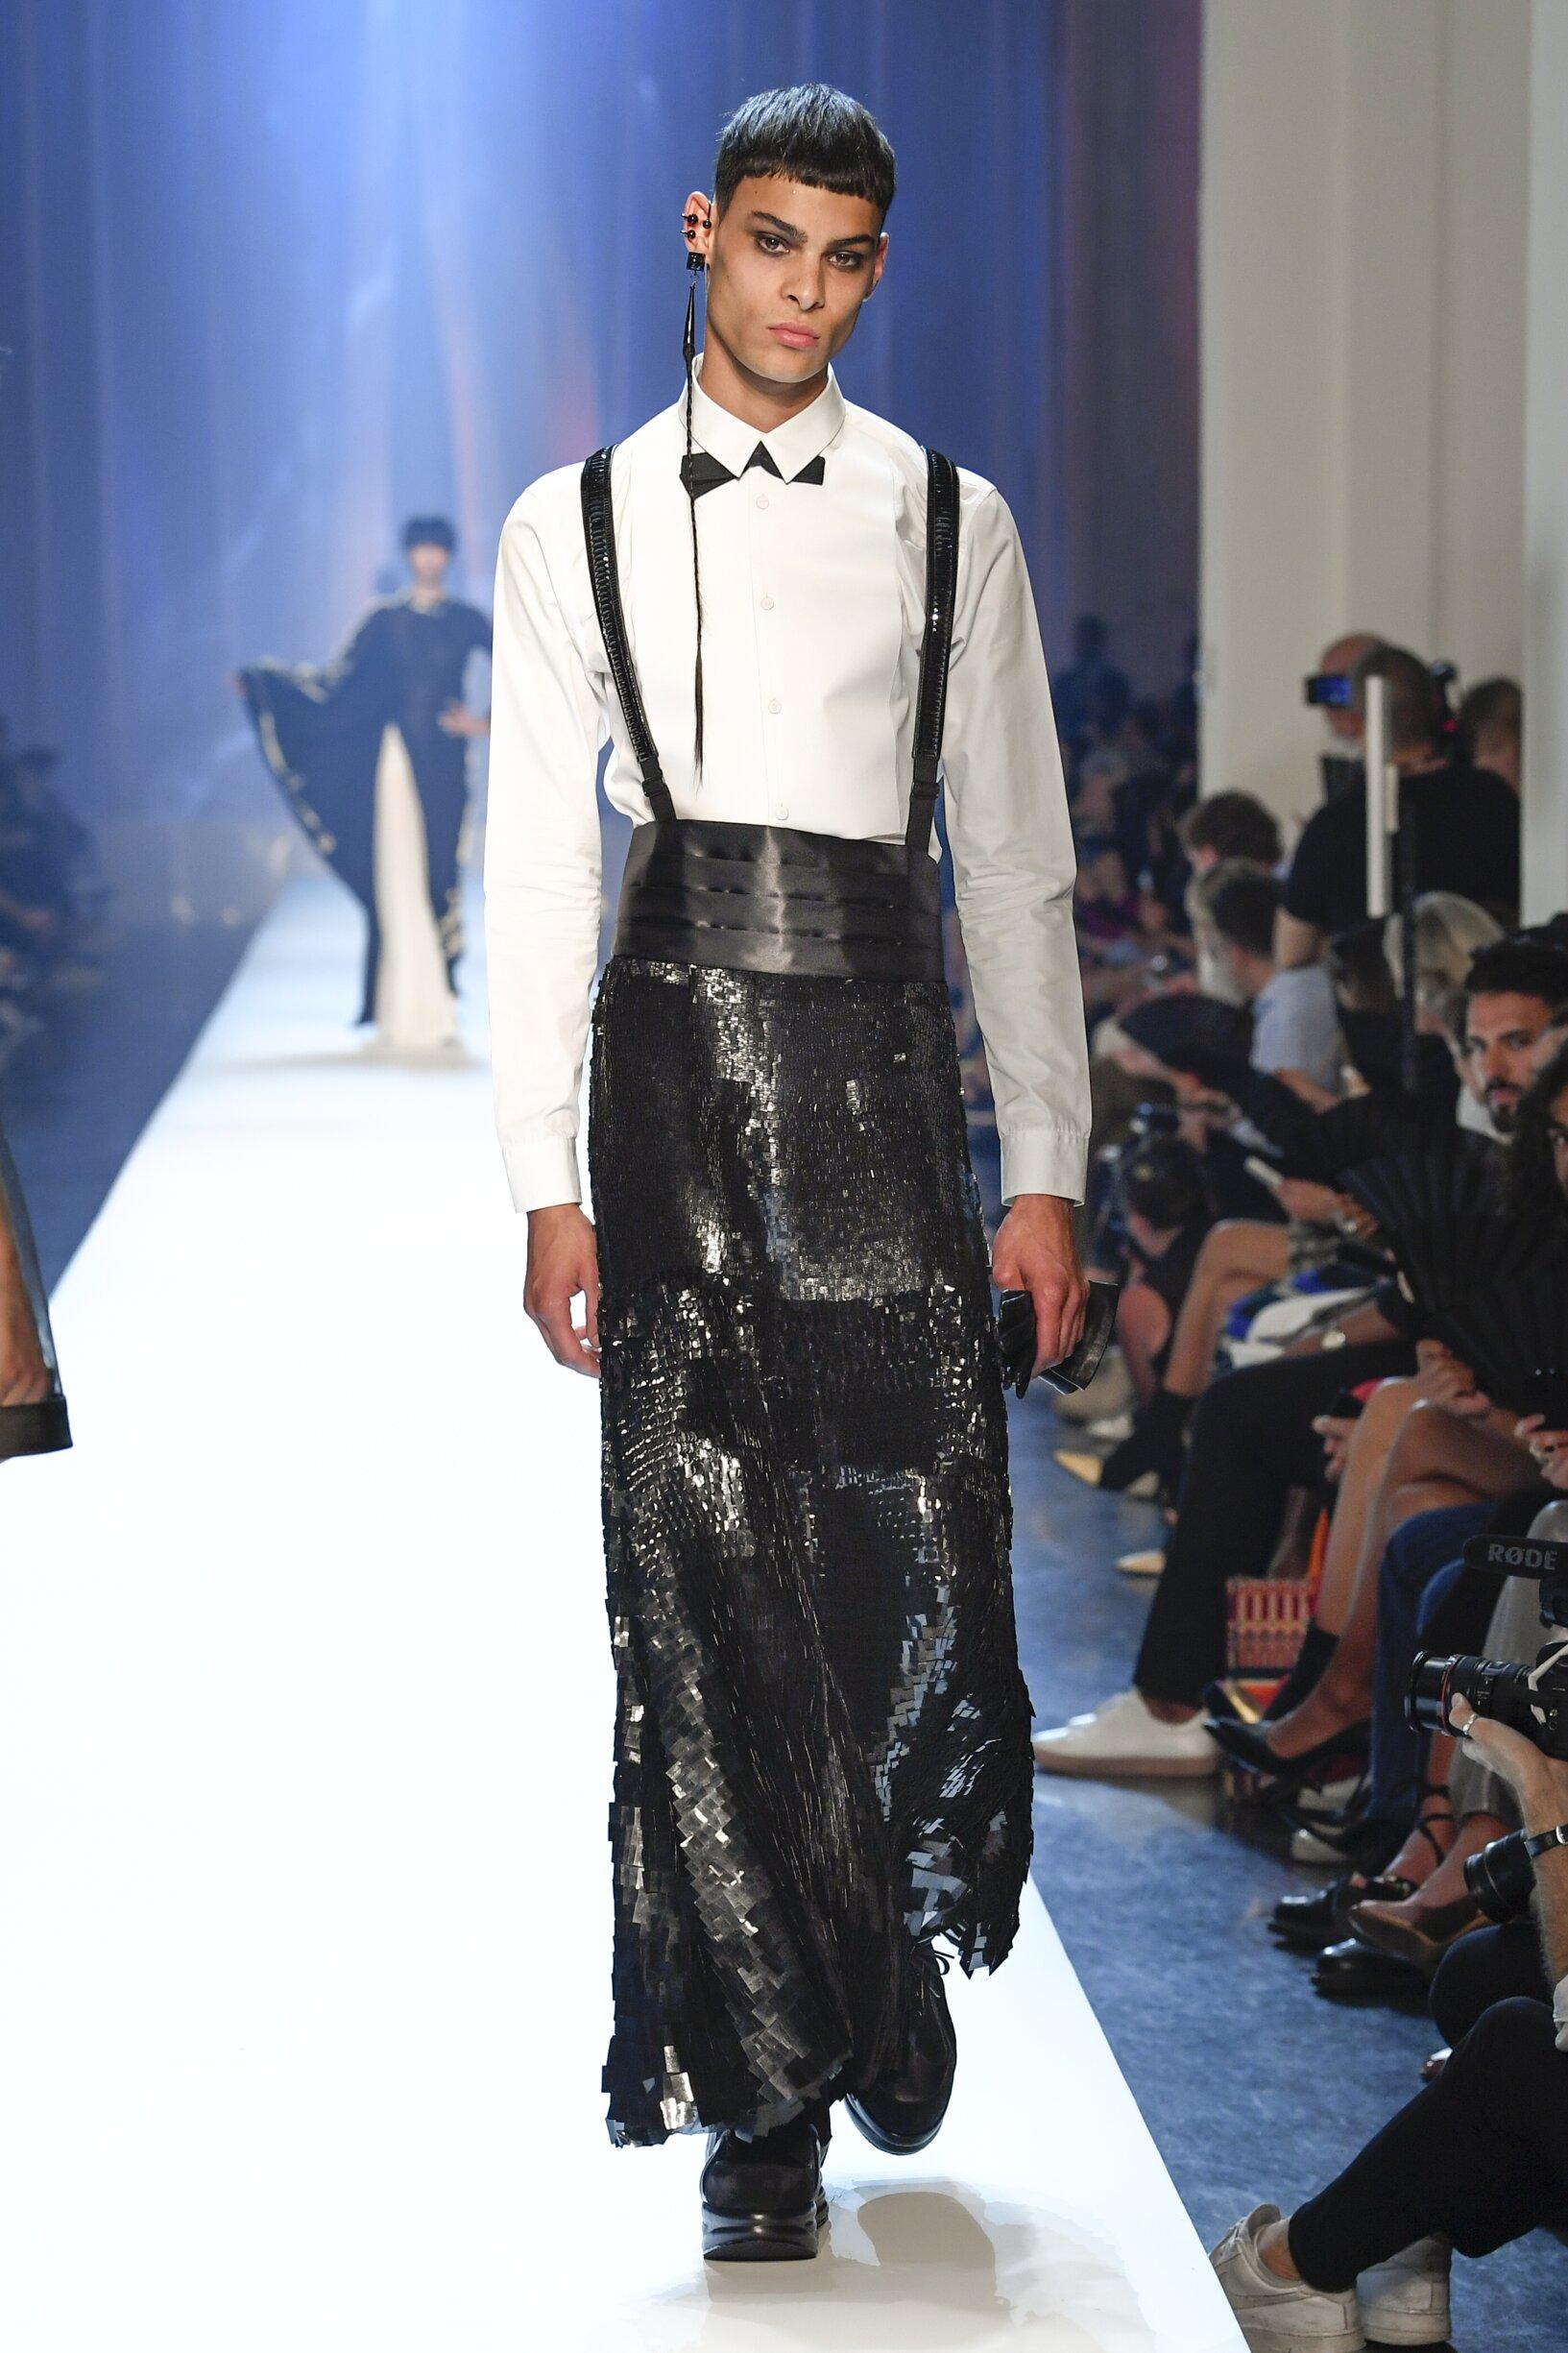 Fashion 2018 Catwalk Jean-Paul Gaultier Haute Couture Winter Mens Collection